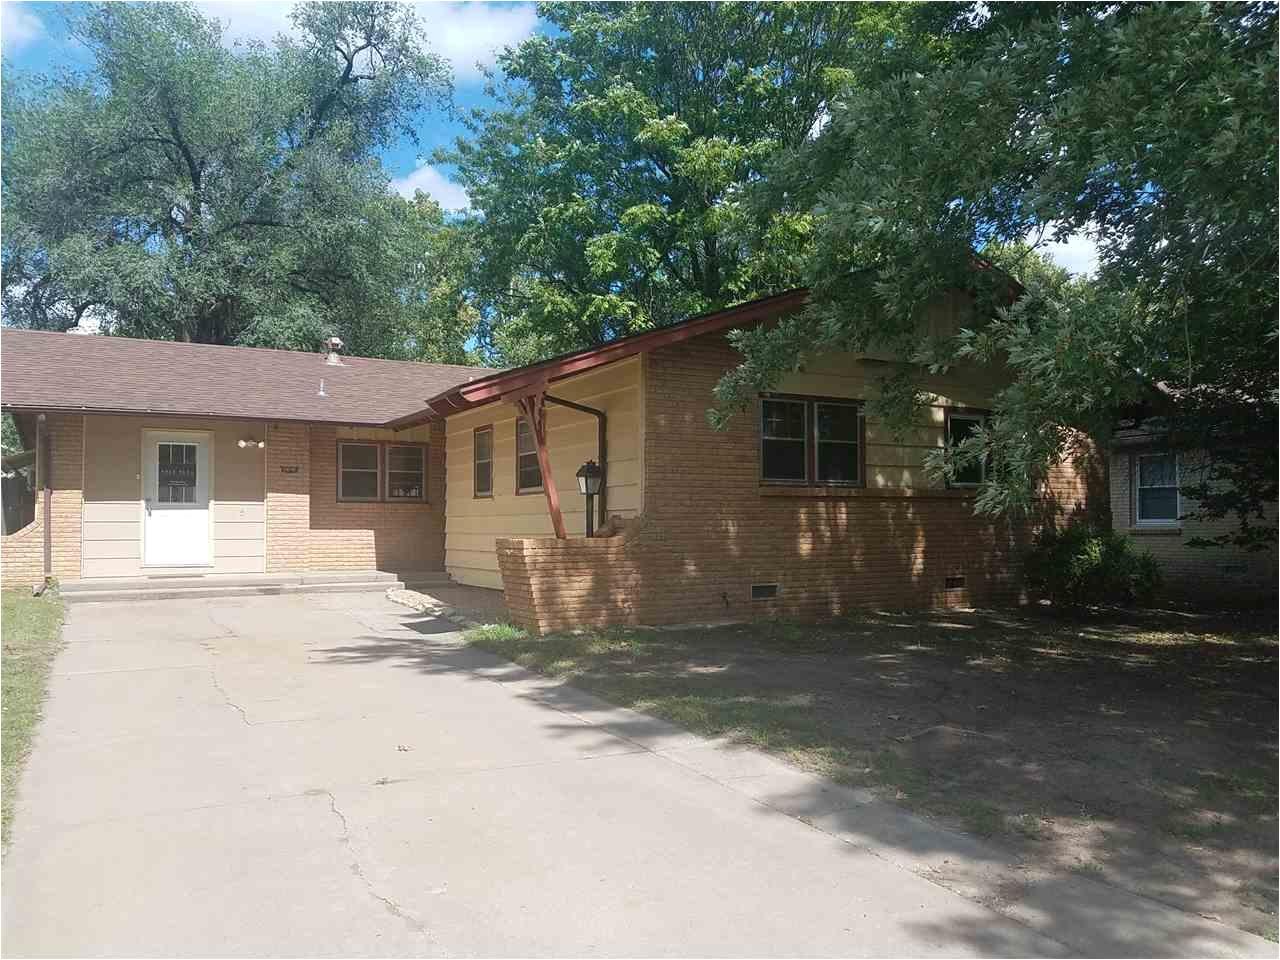 Homes for Sale In Wichita Kansas 2610 W Manhattan Dr Wichita Ks 67204 Team Cooley Realtors